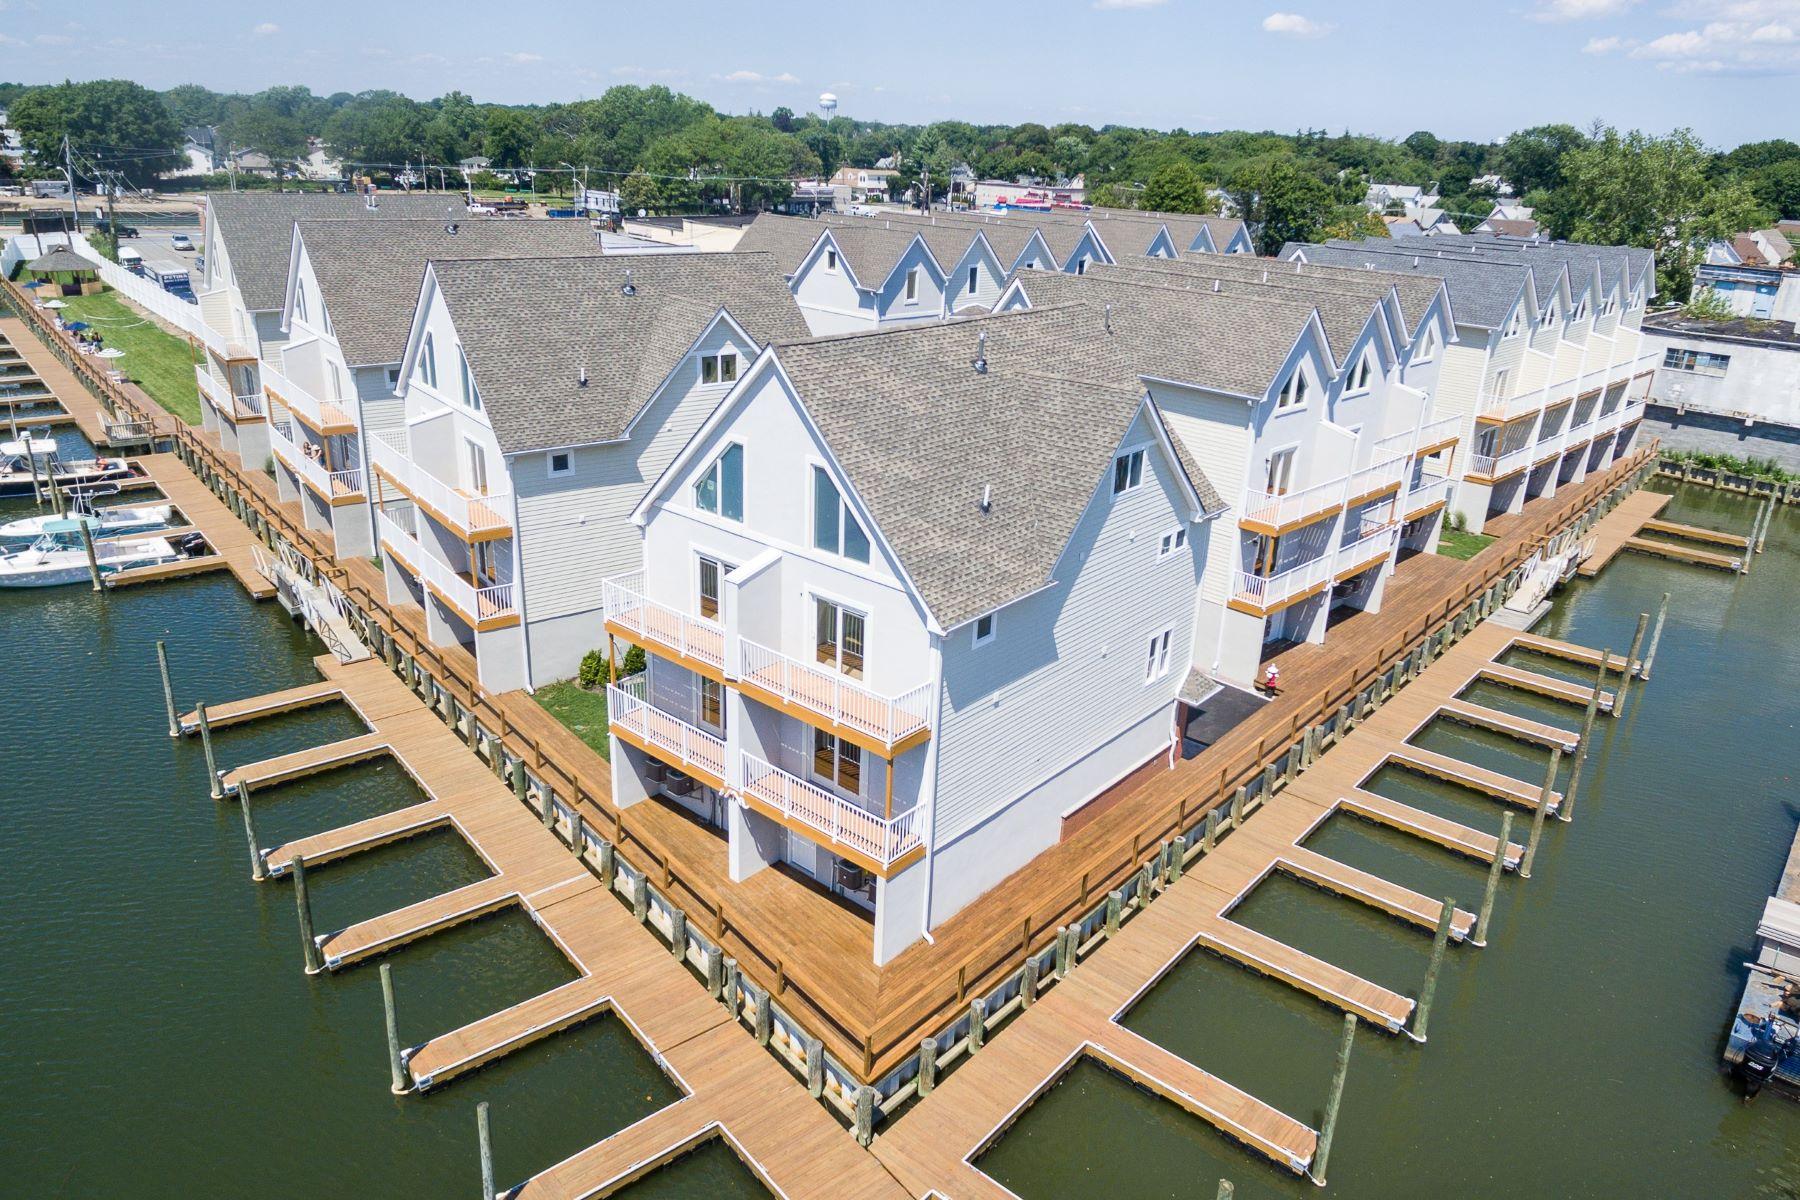 Condominium for Sale at Condo 600 Ray St 23 Freeport, New York 11520 United States